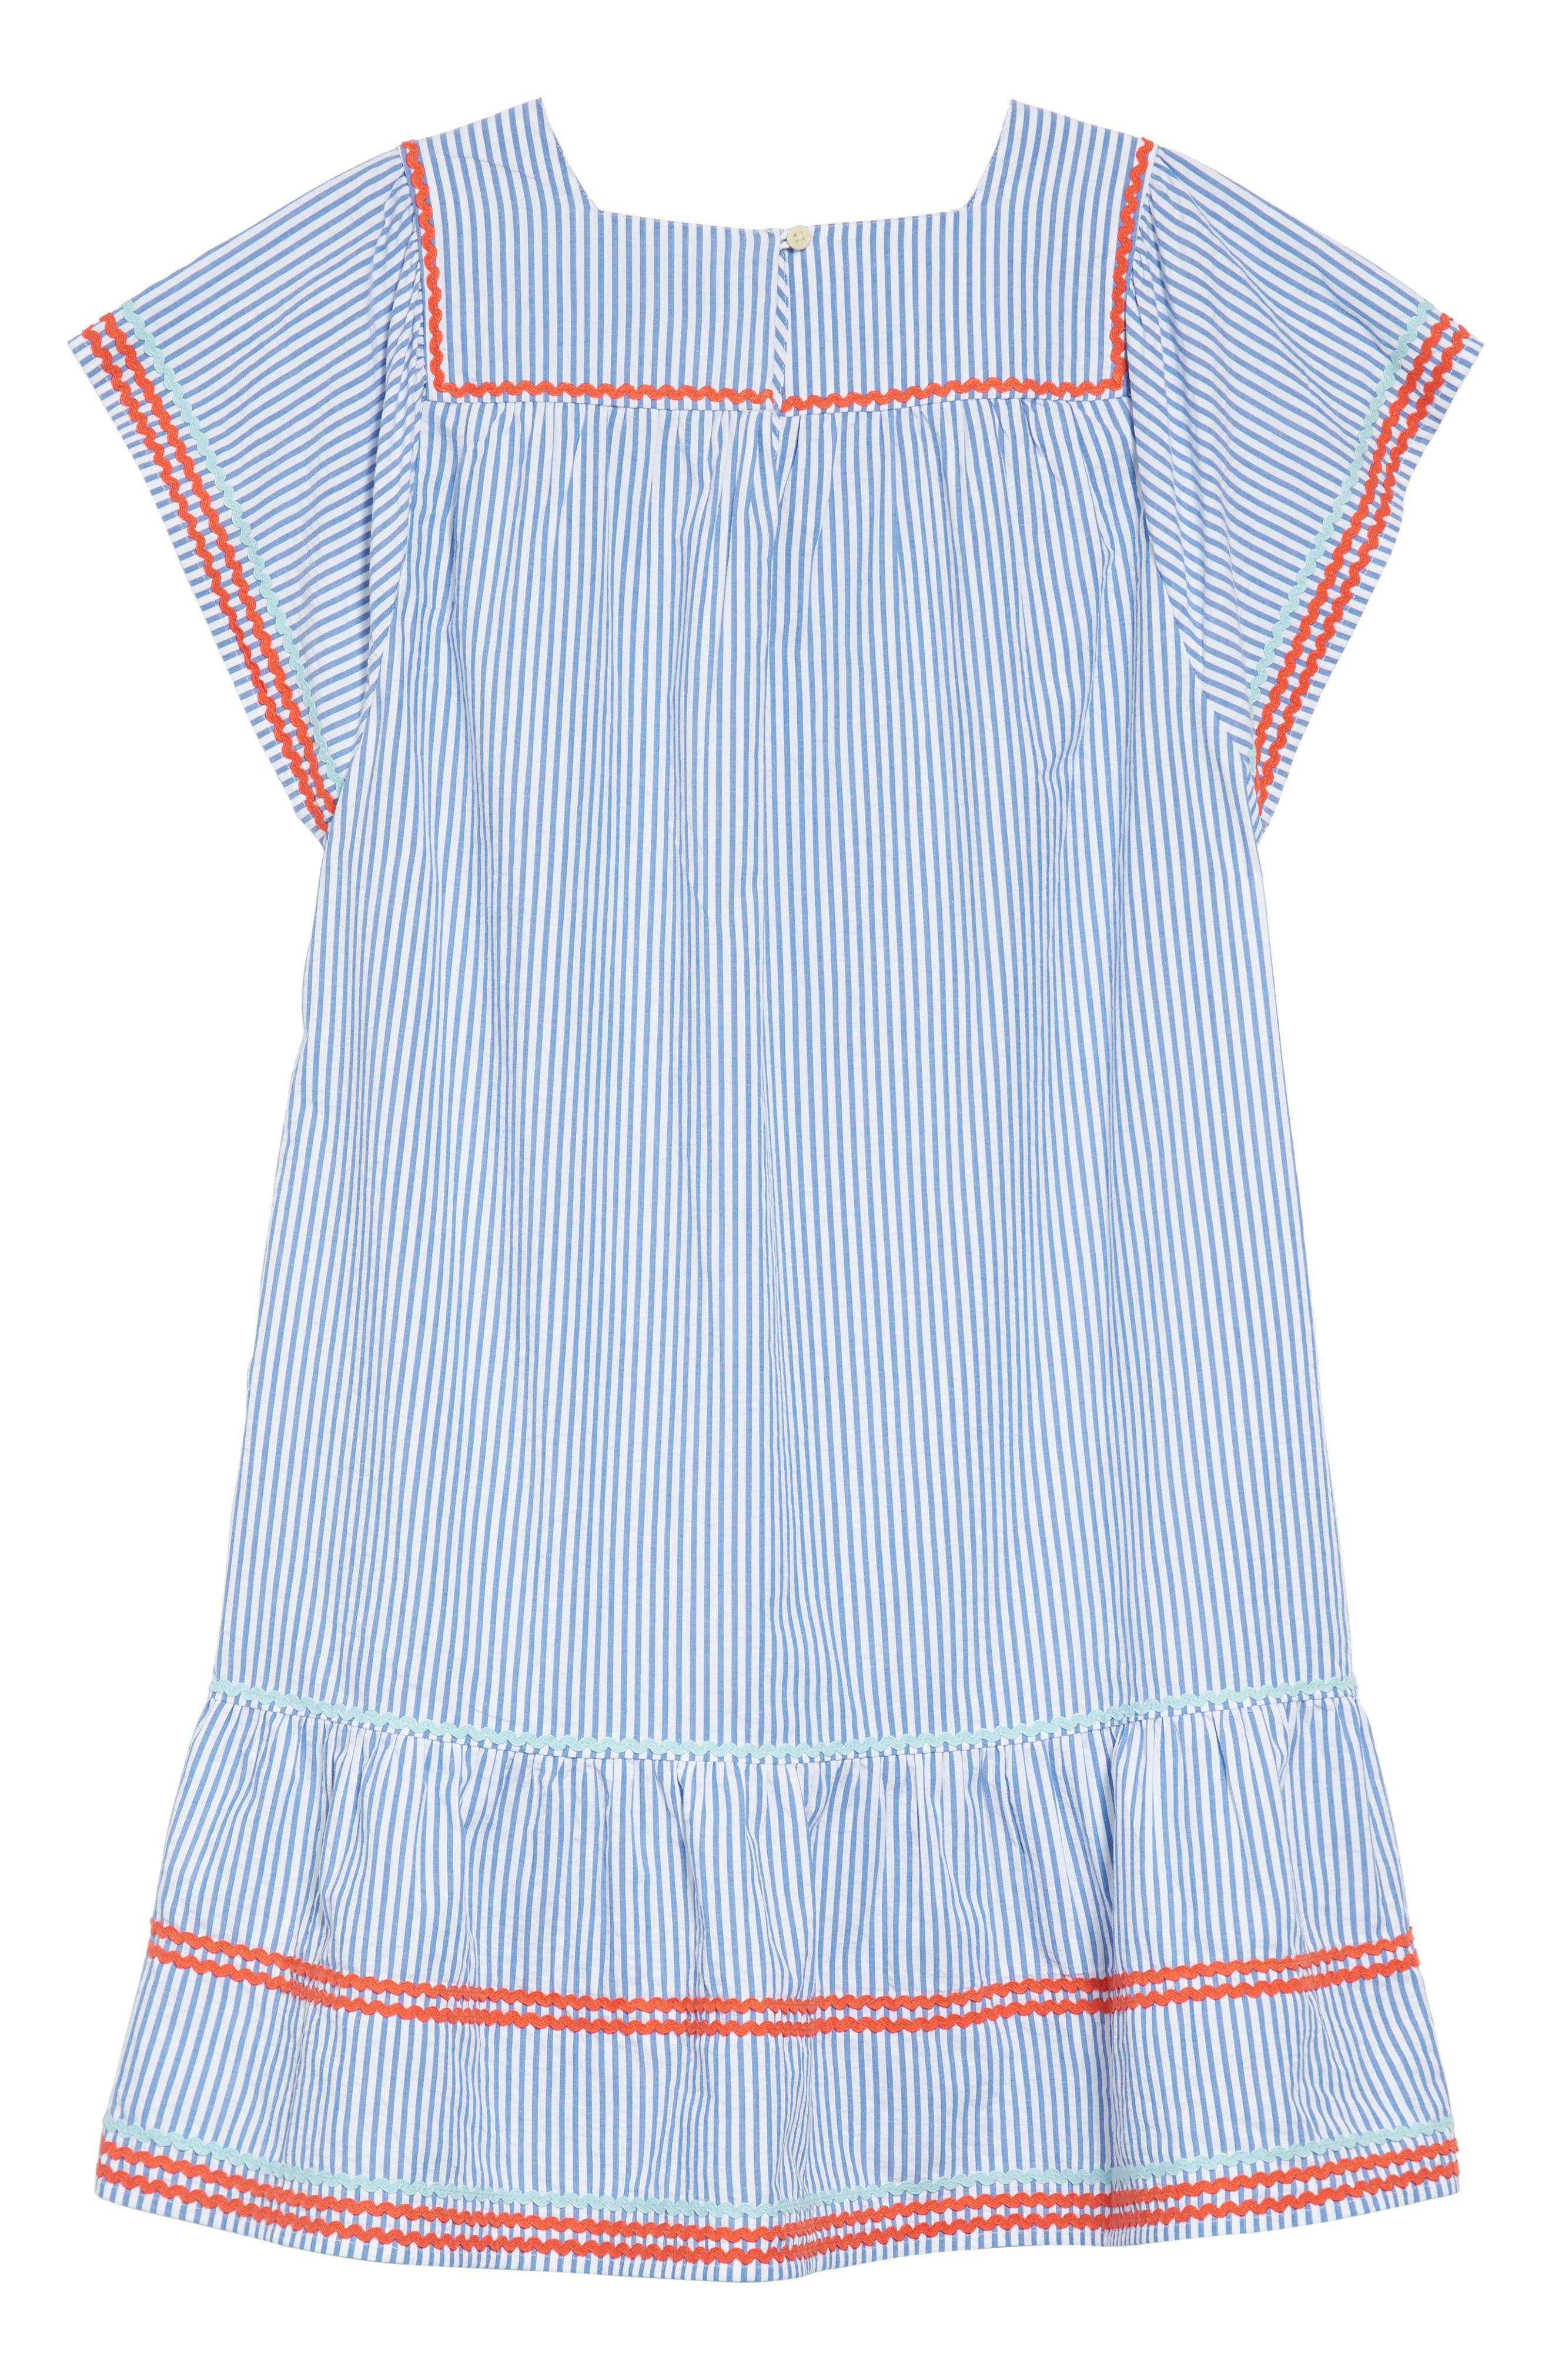 Bardot Rickrack Seersucker Dress,                             Alternate thumbnail 2, color,                             400